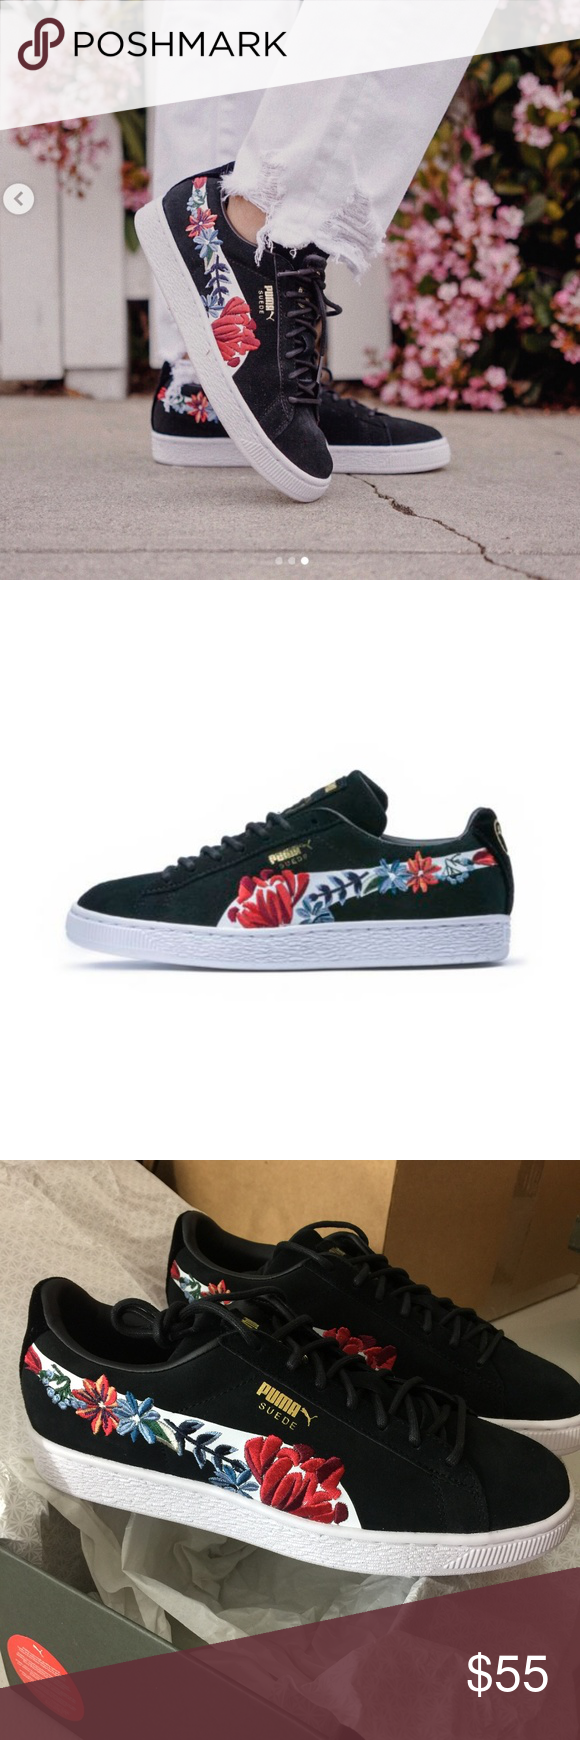 NIB Suede Hyper Embellished Sneaker